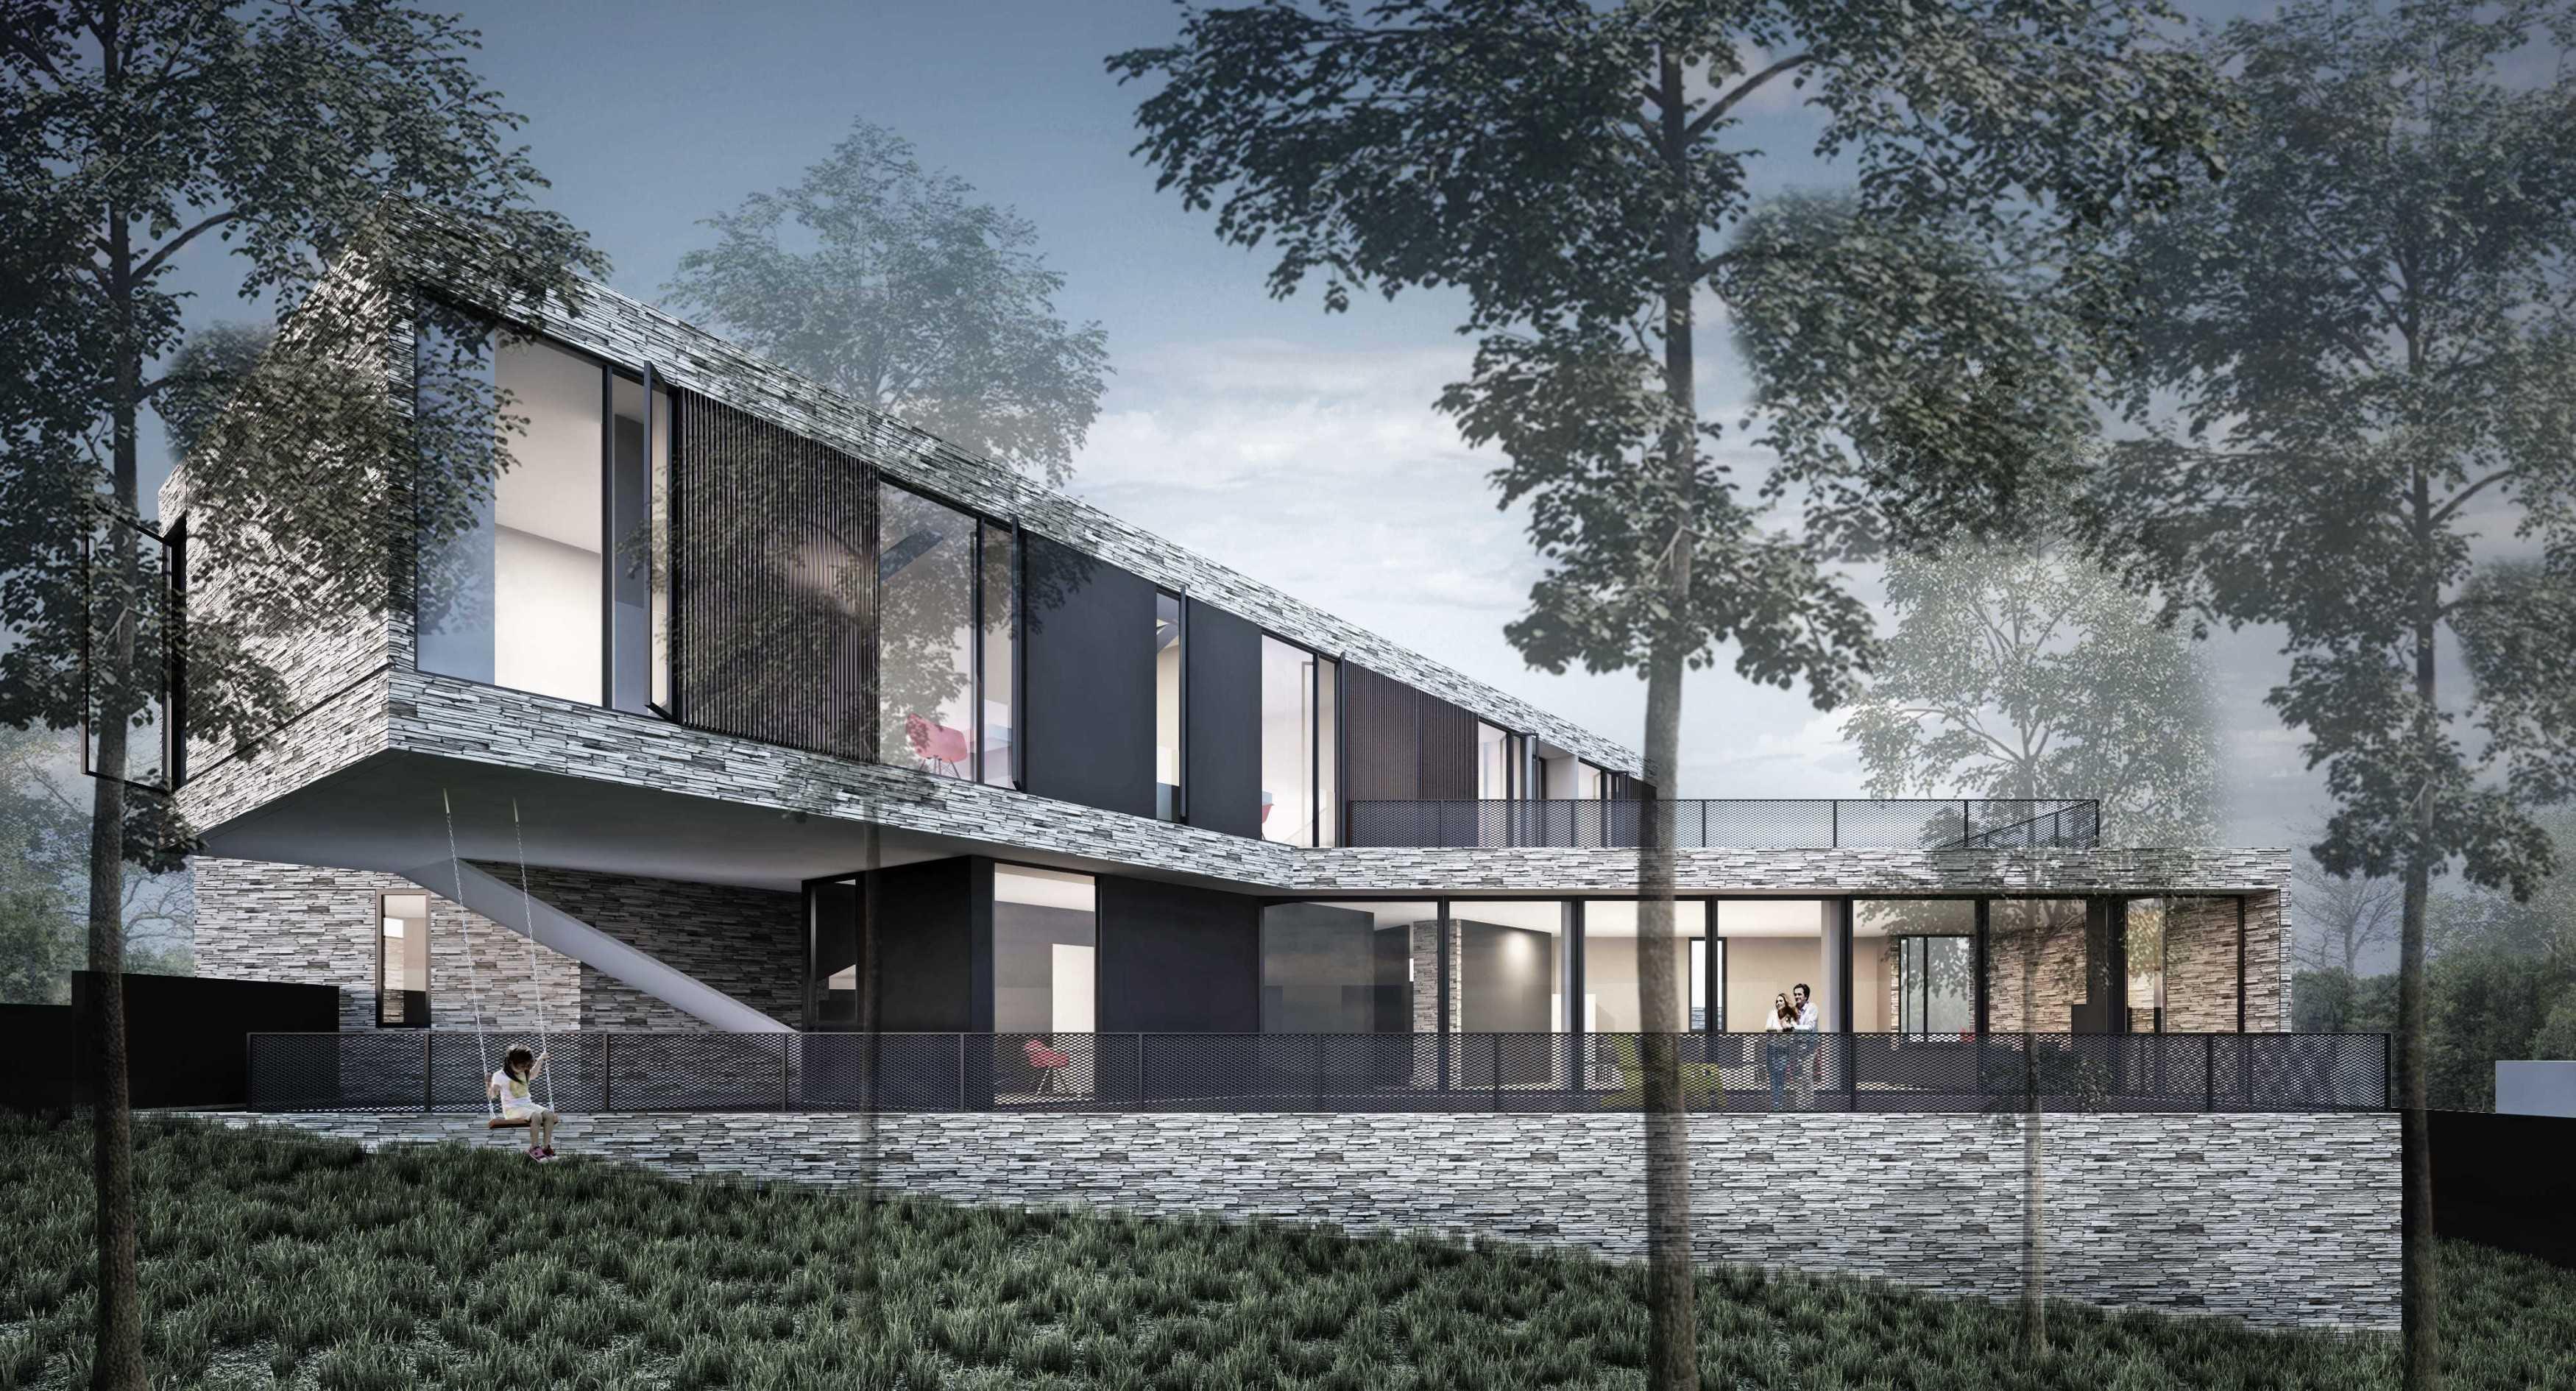 Ivan Priatman Architecture Clove View House Malang, Jawa Timur, Indonesia Malang, Jawa Timur, Indonesia Ivan-Priatman-Architecture-Clove-View-House   59116